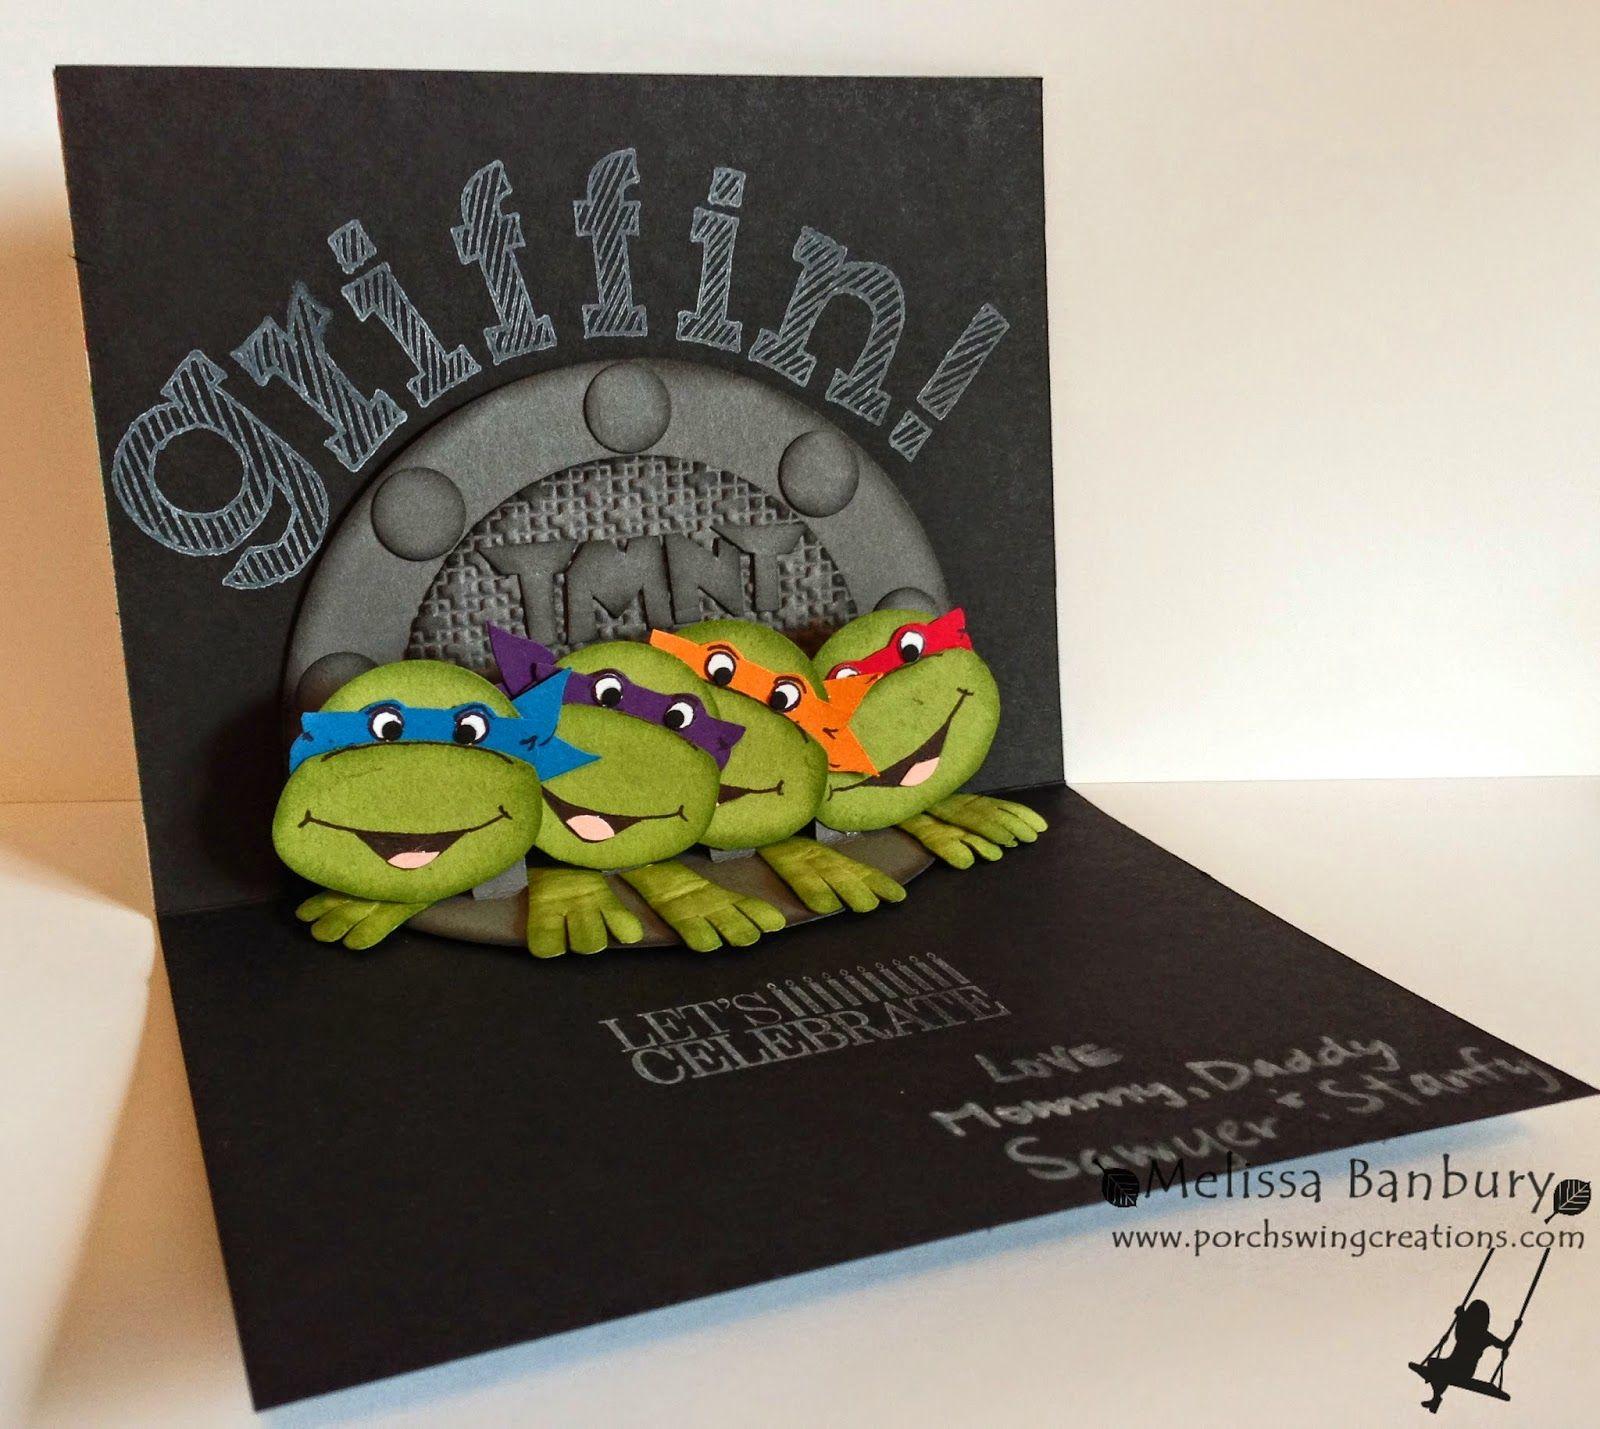 Porch Swing Creations Teenage Mutant Ninja Turtle Birthday Teenage Mutant Ninja Turtles Cards Cool Birthday Cards Punch Art Cards